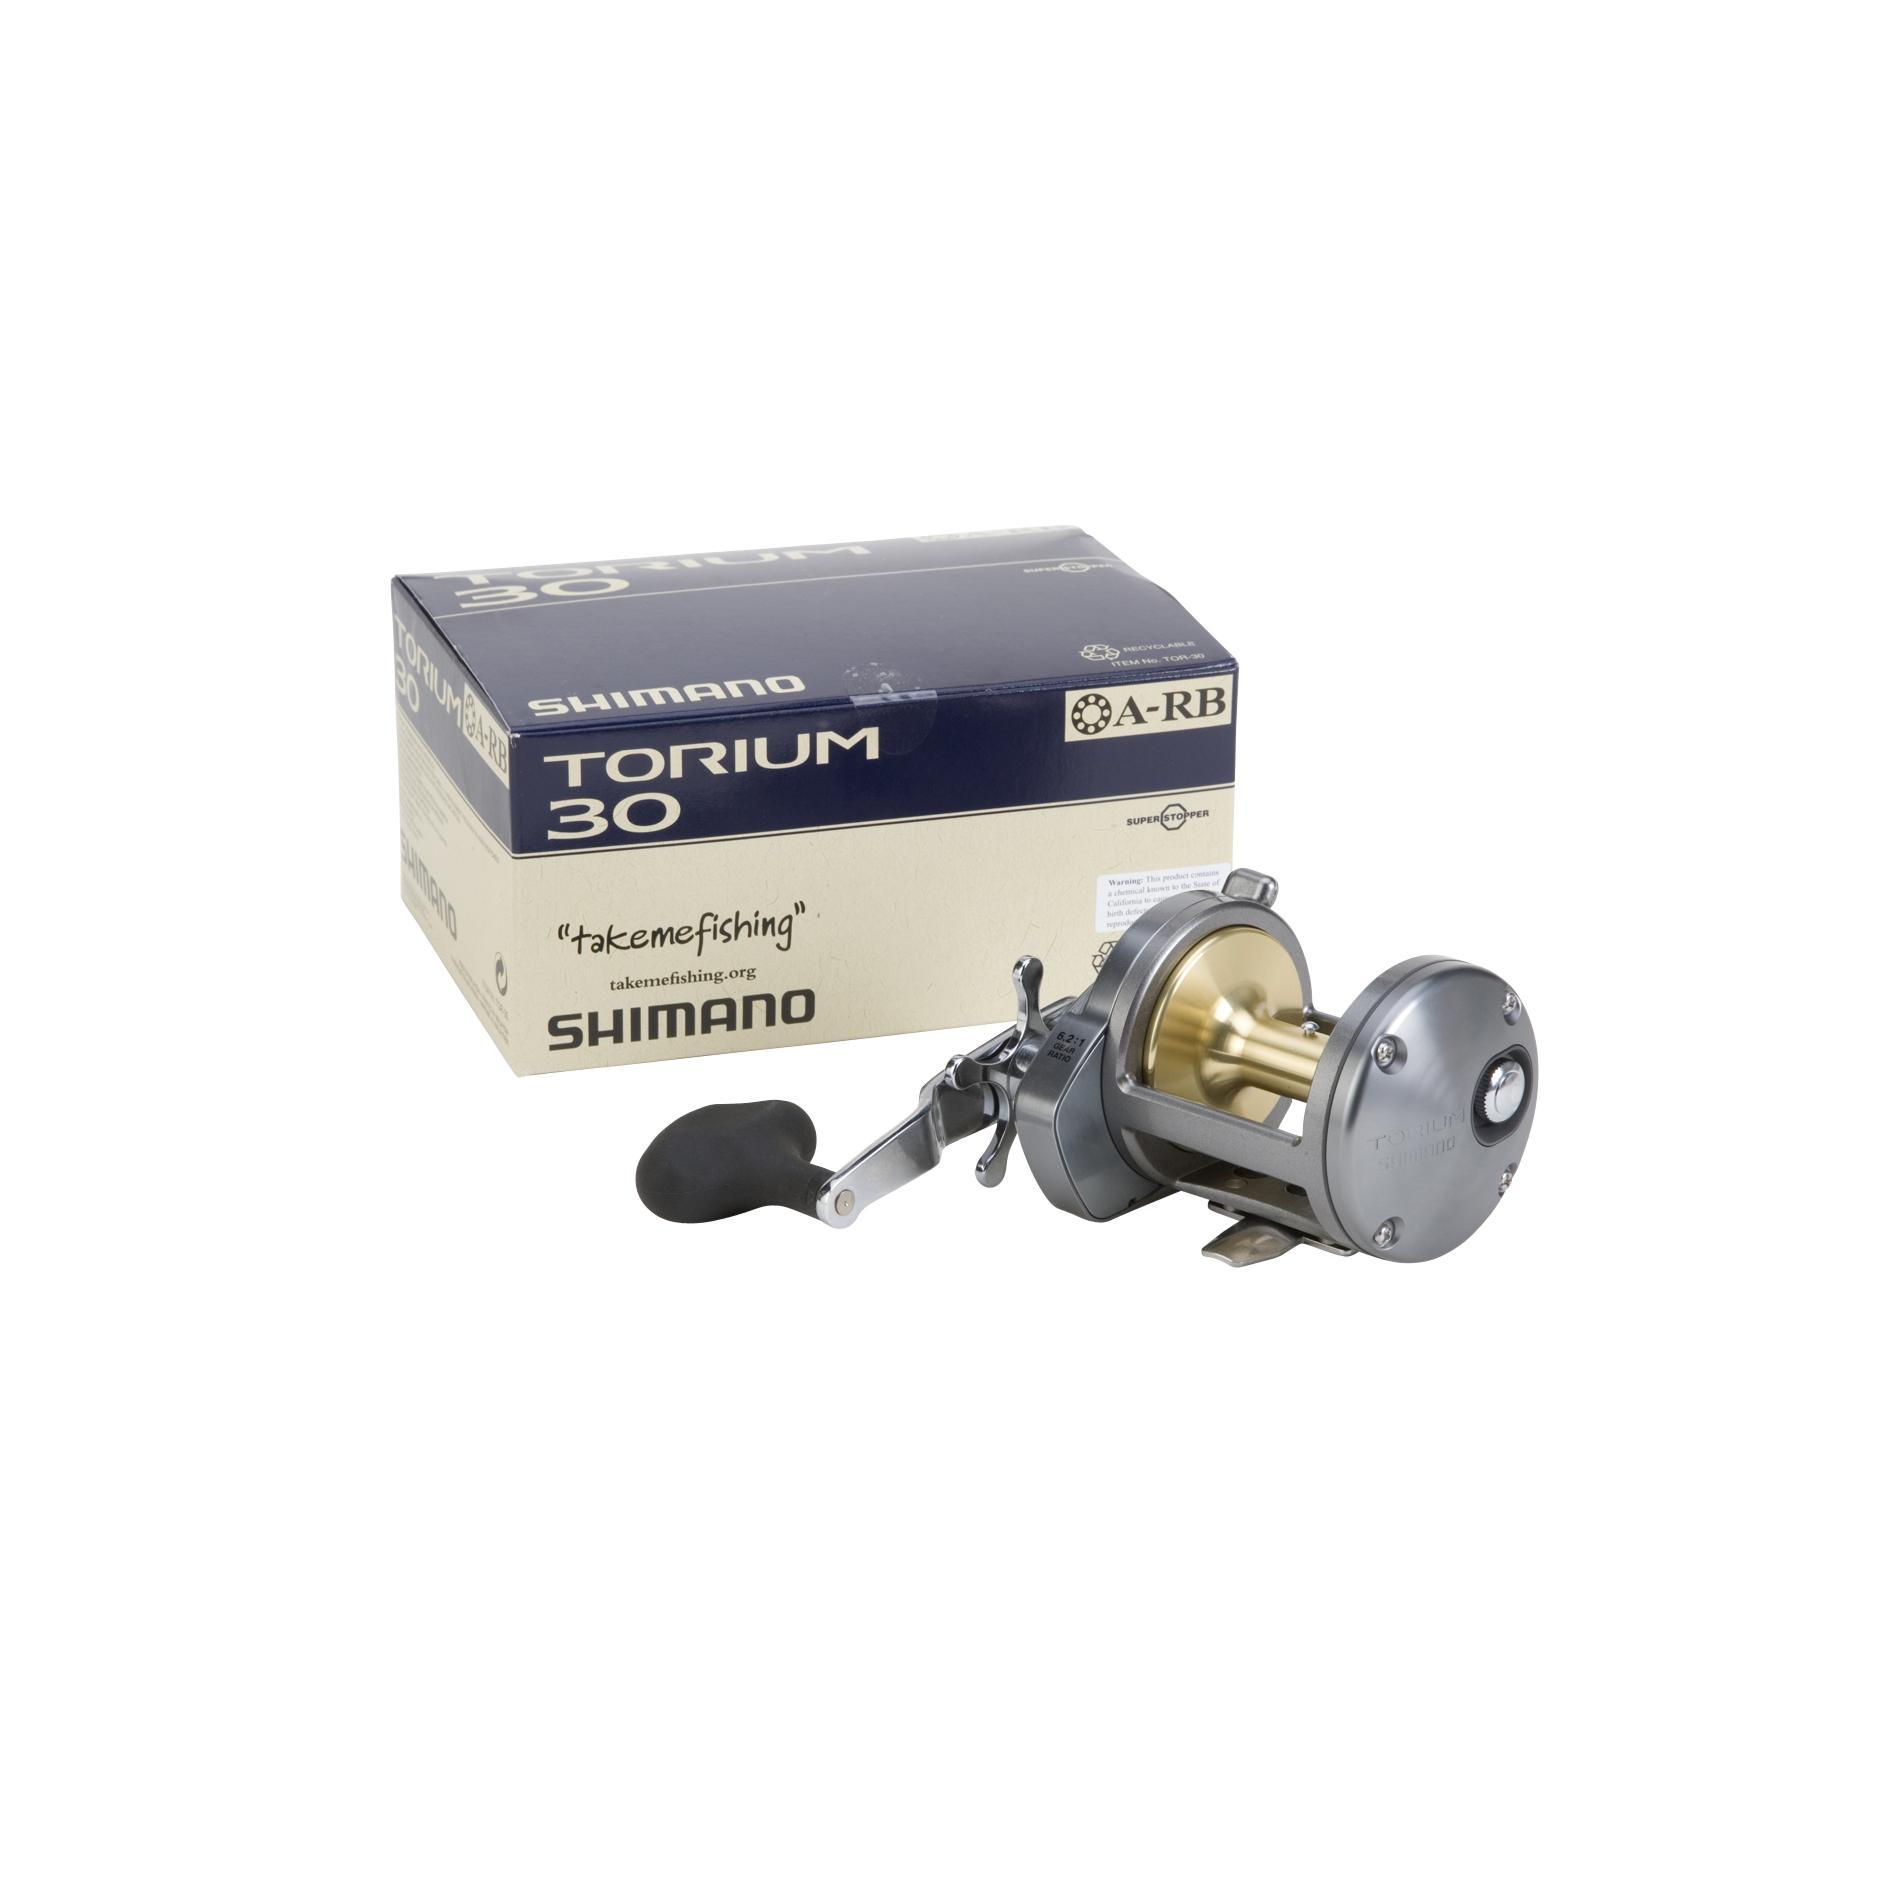 Shimano Torium 30 Conventional Spinning Reel